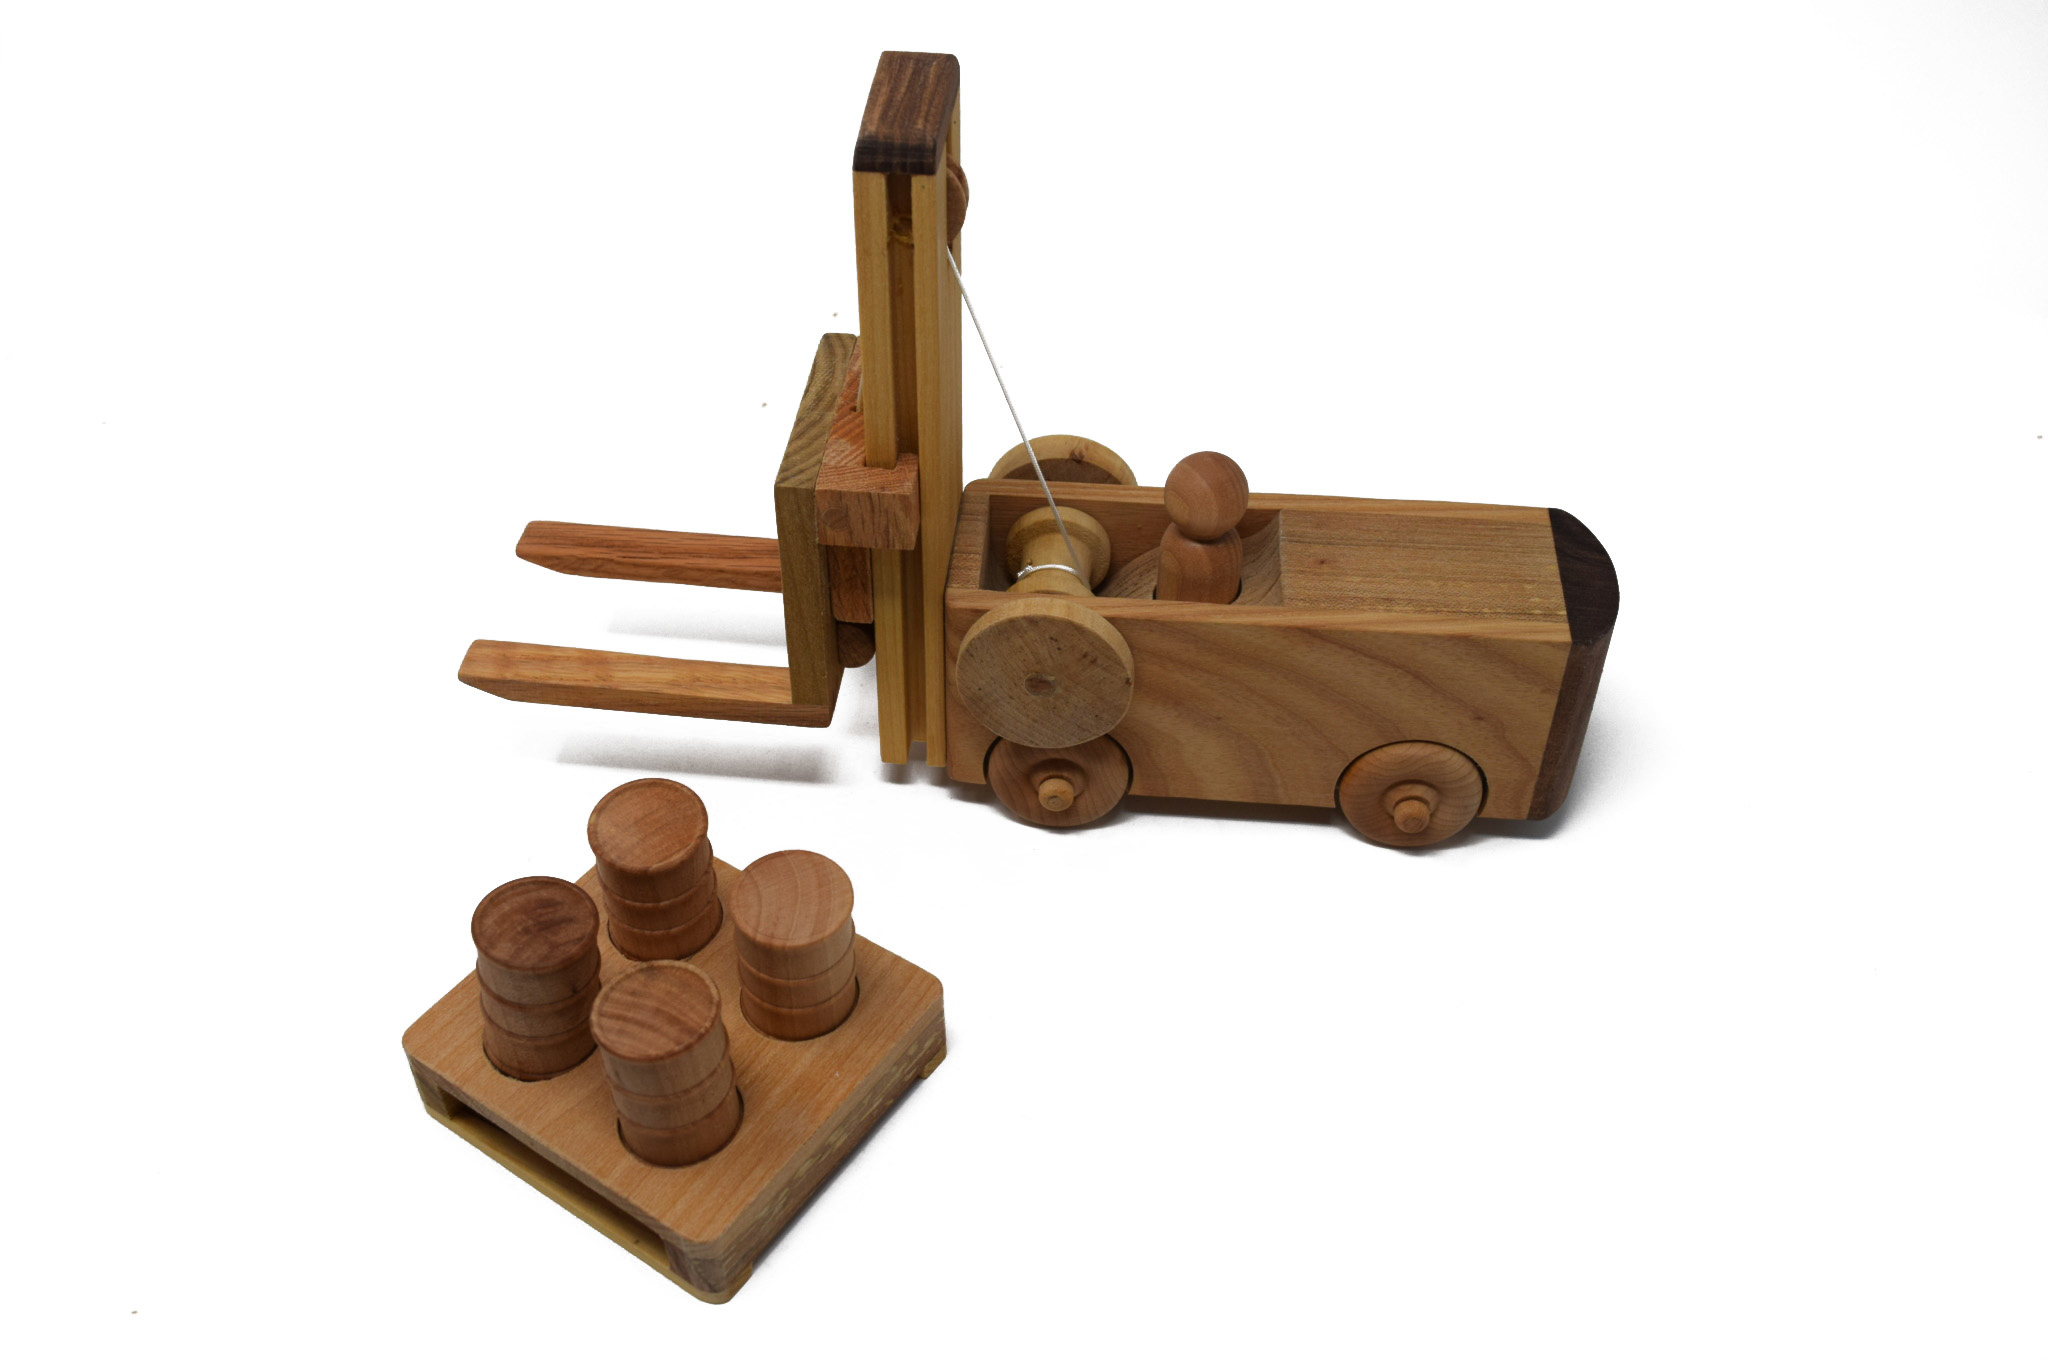 Wooden Forklift Toy-2